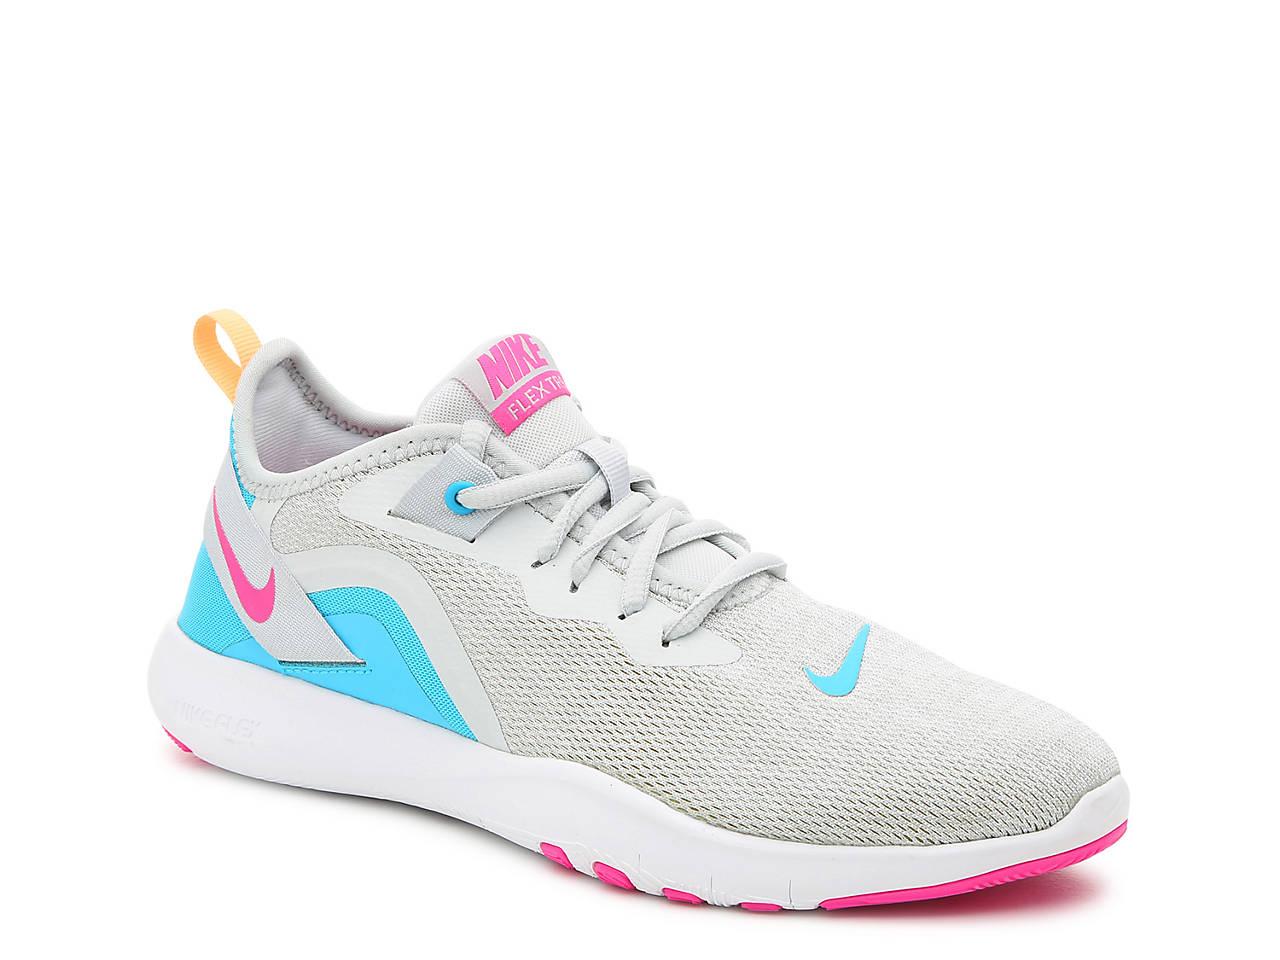 850dba011b88 Nike Flex TR 9 Lightweight Training Shoe - Women s Women s Shoes